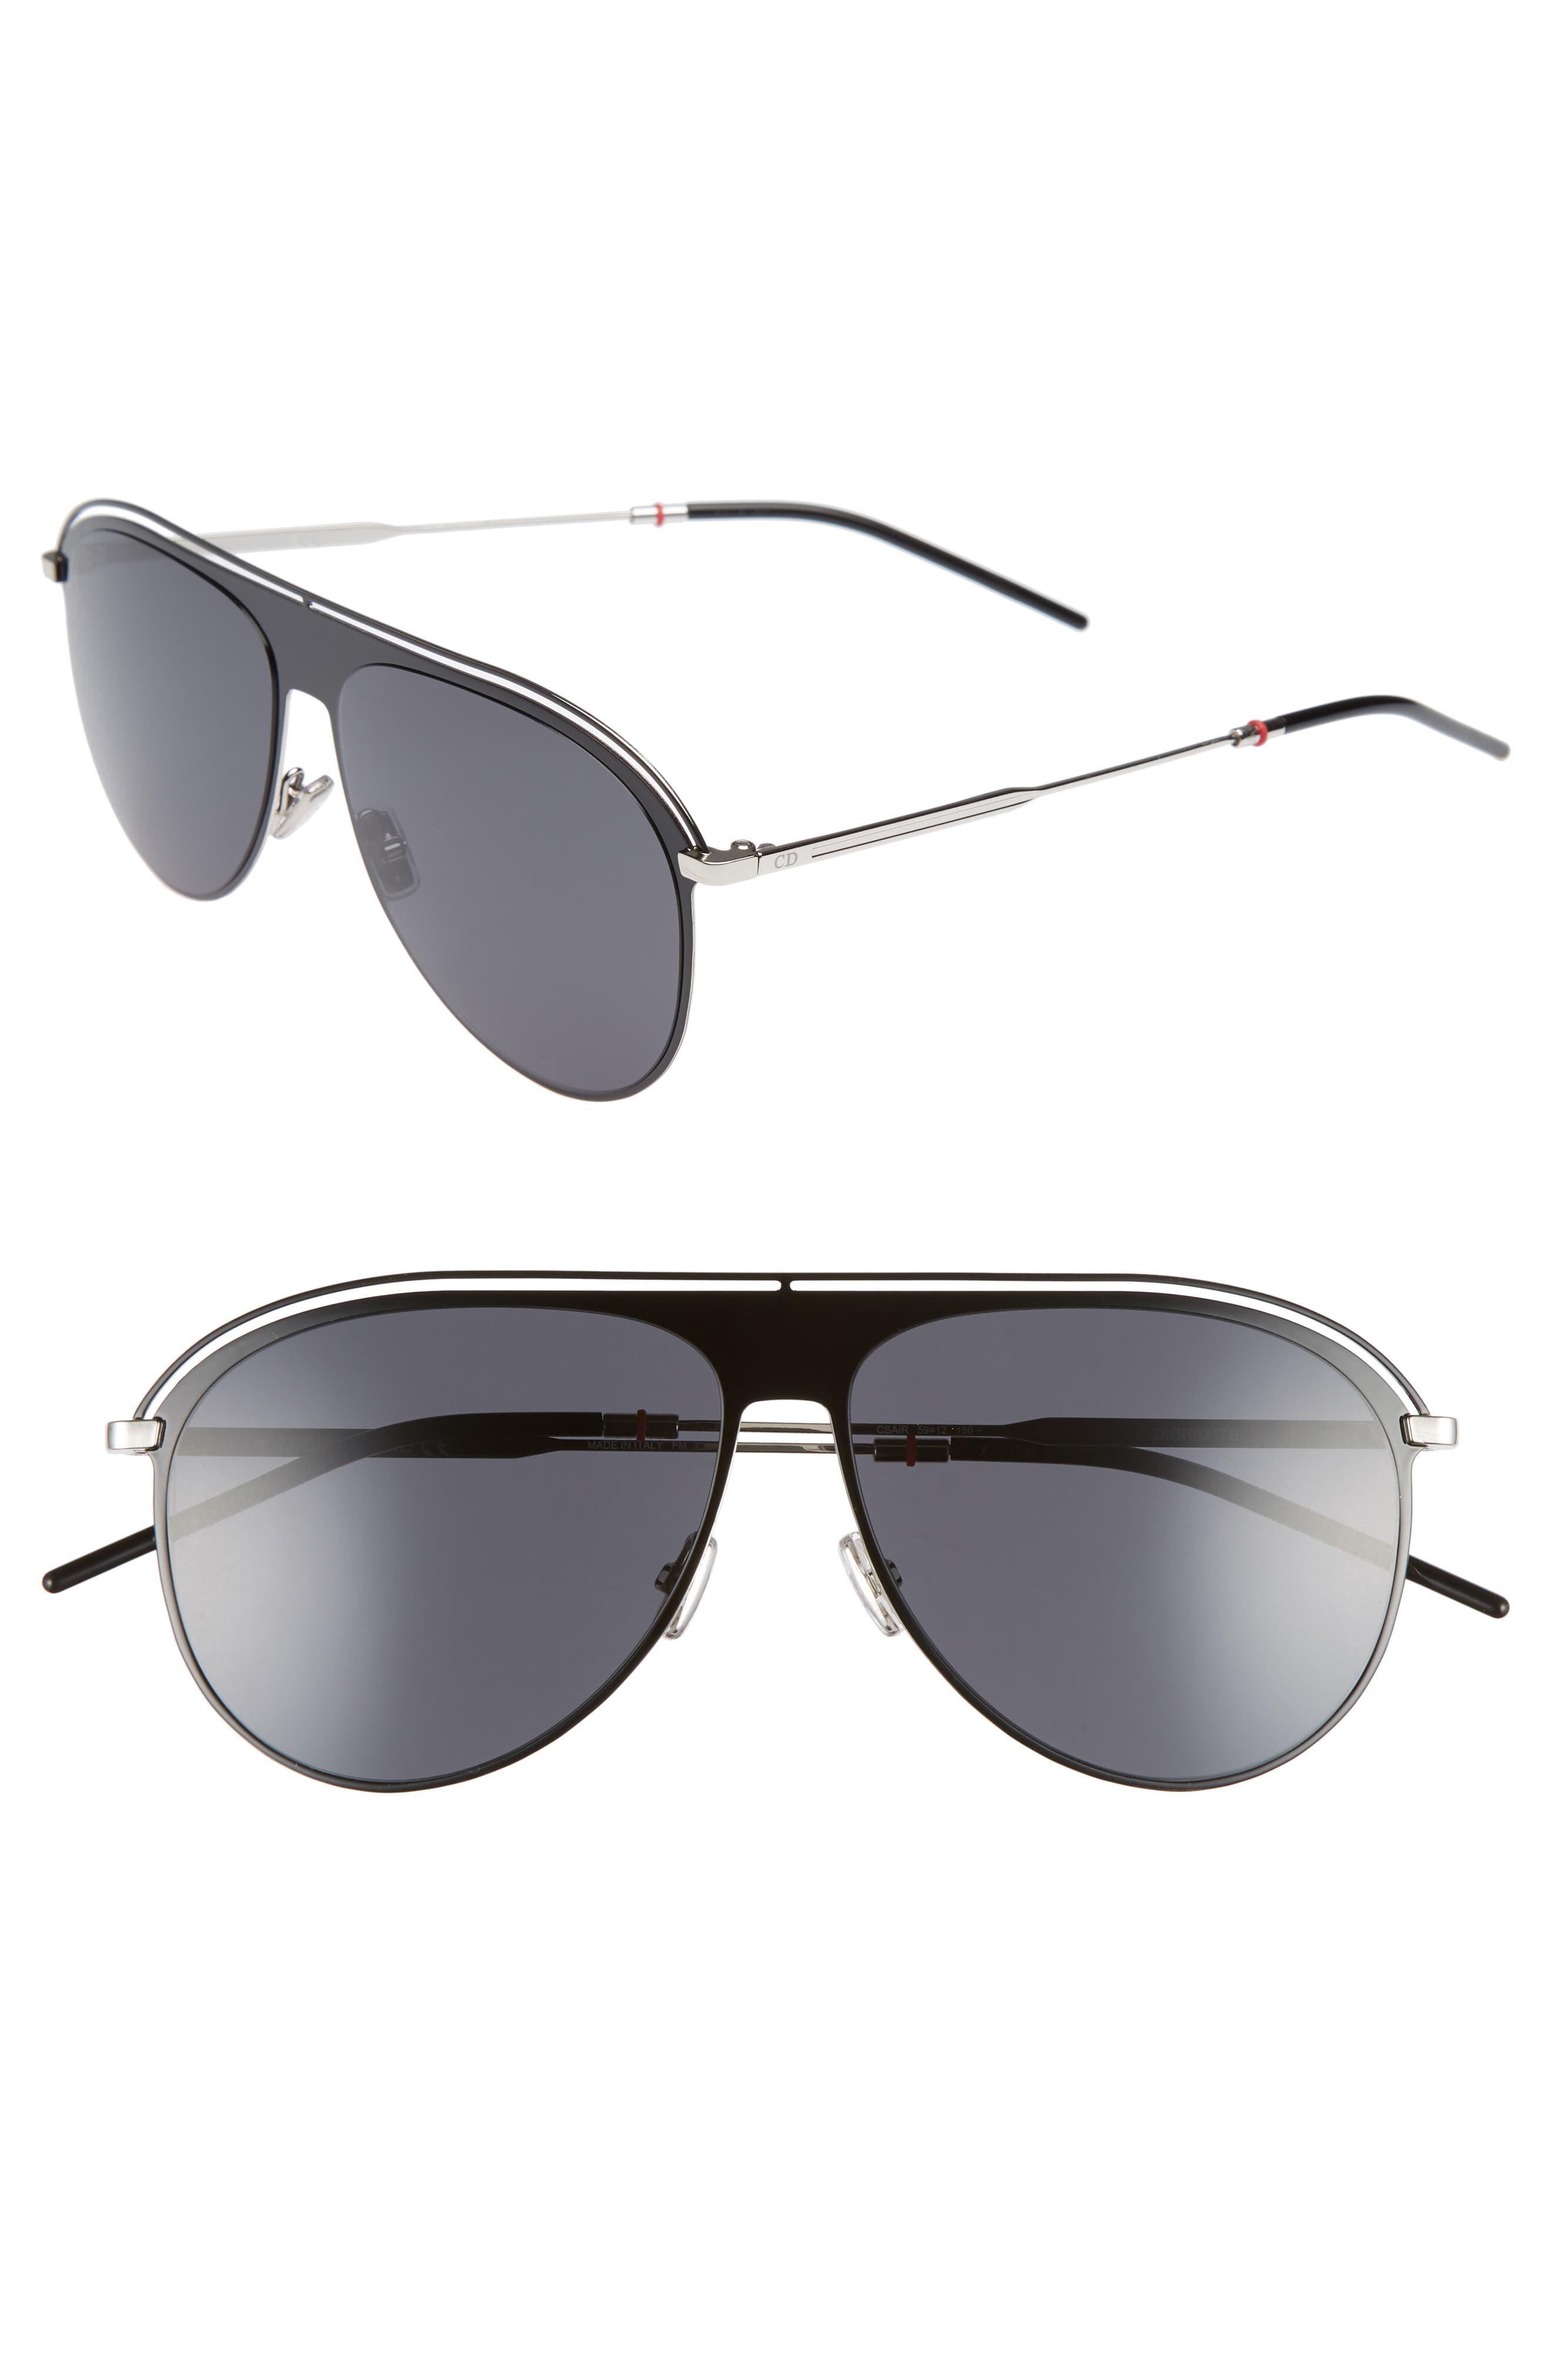 59mm Polarized Aviator Sunglasses,                             Main thumbnail 1, color,                             Black Palladium